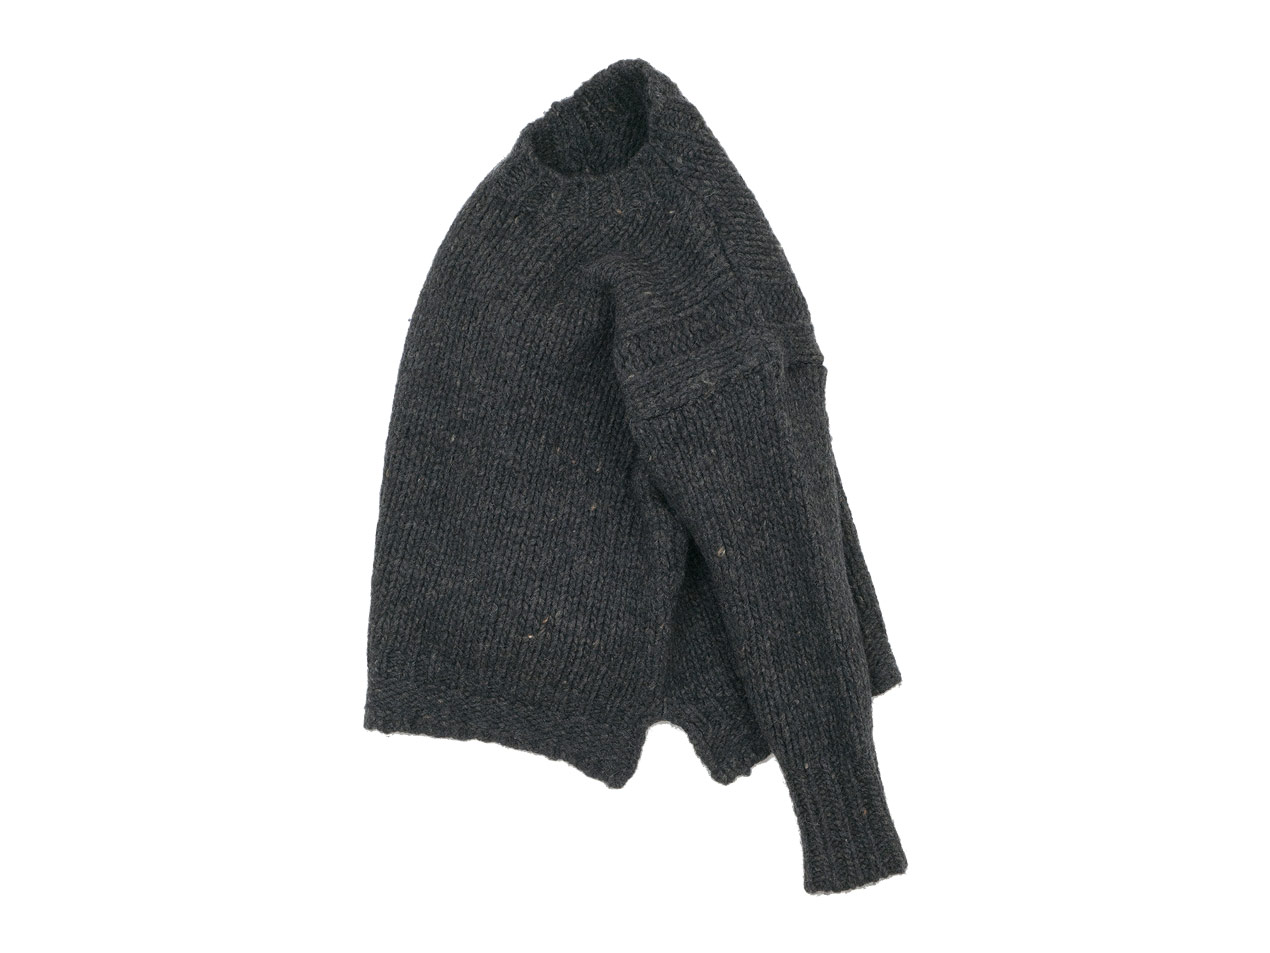 maillot mature hand frame fisherman sweater